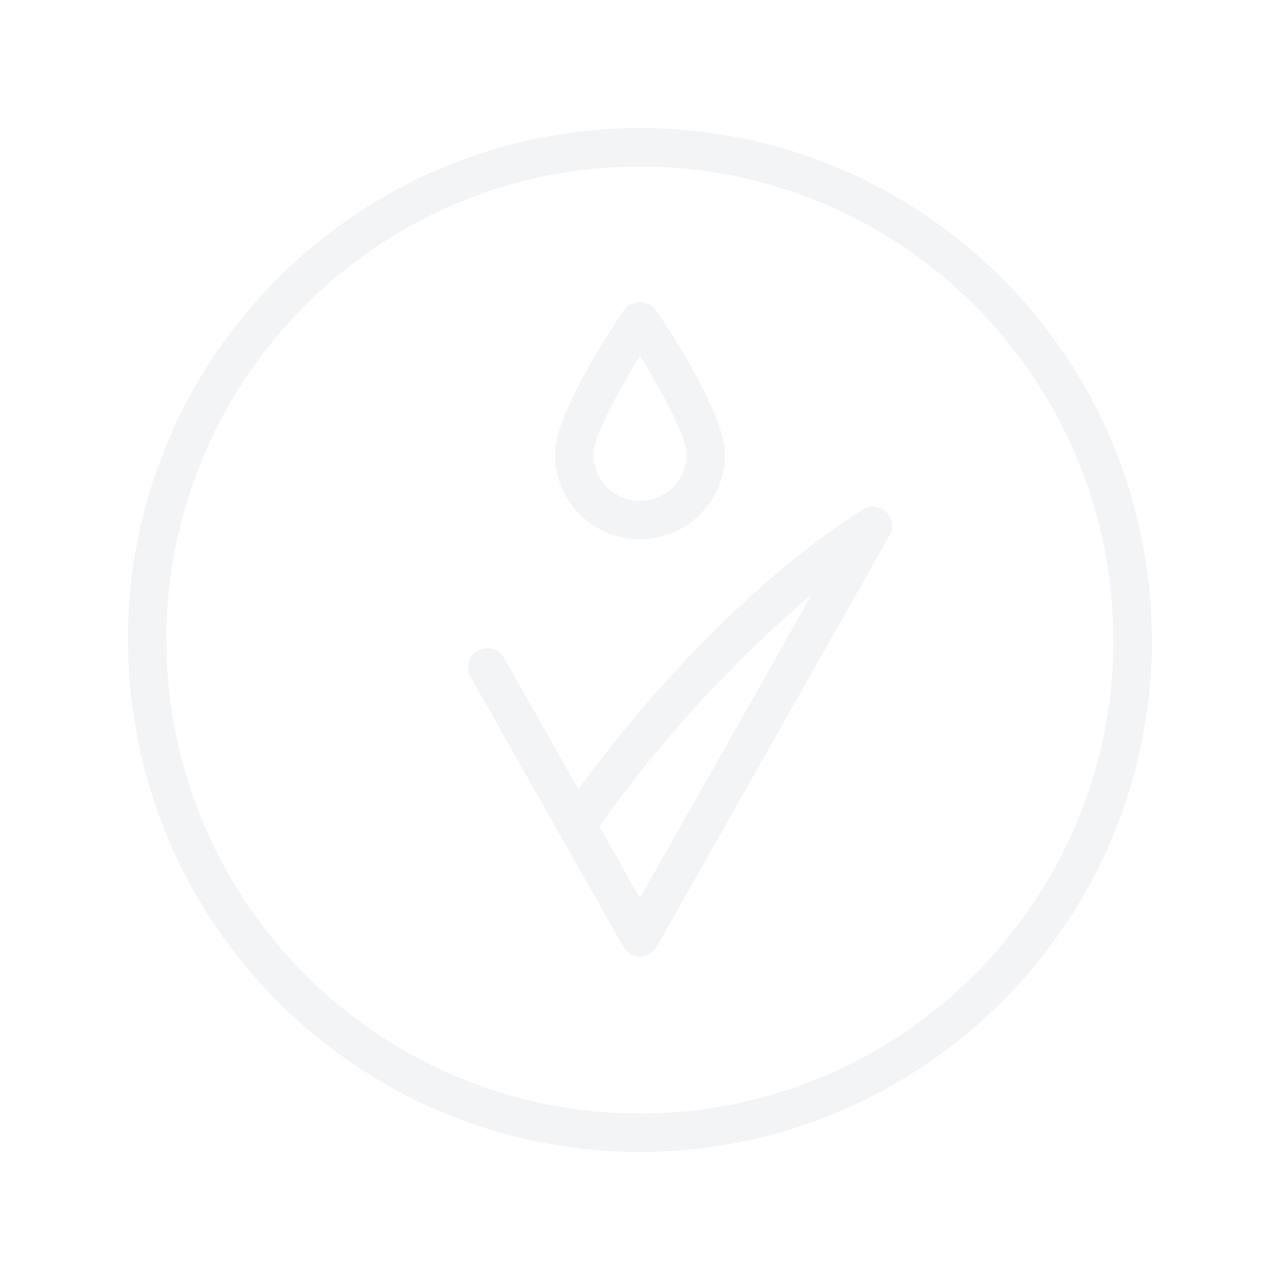 LÖWENGRIP Good To Go Light Dry Shampoo Apple & Cedarwood